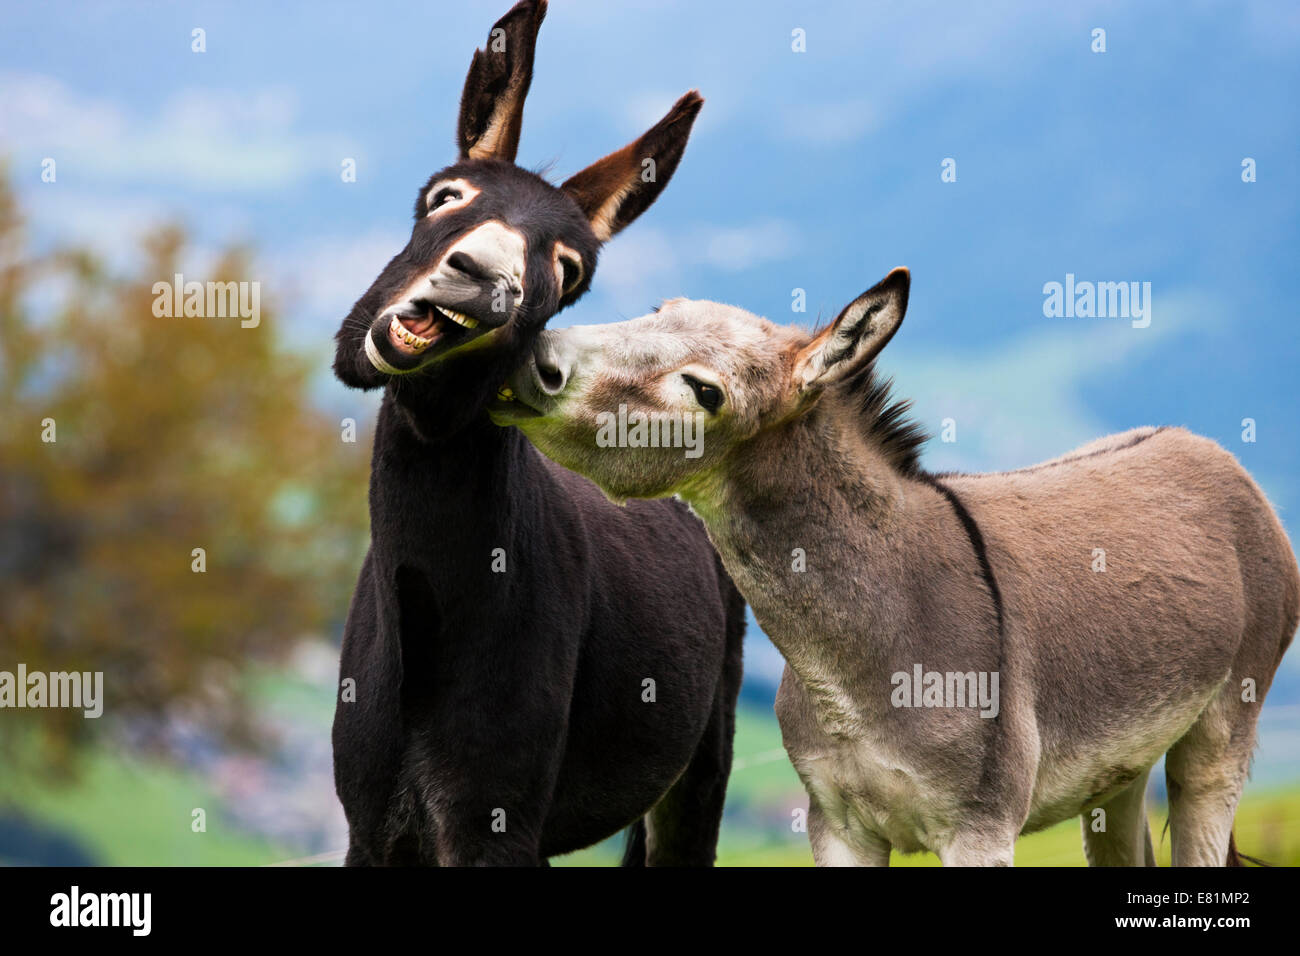 Donkeys, half-breeds, playing together, North Tyrol, Austria - Stock Image